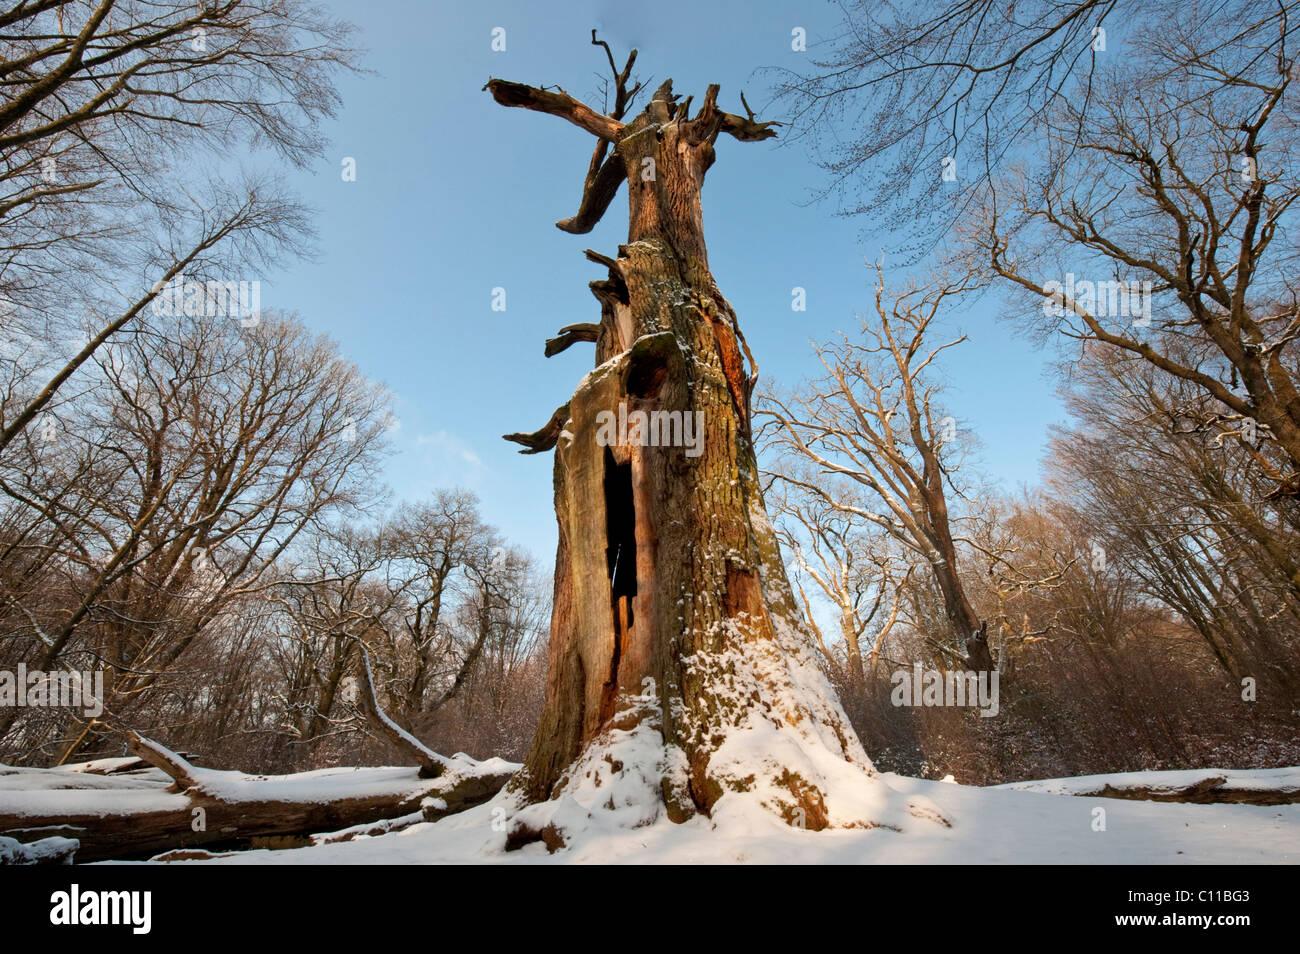 Oak in snow, Urwald Sababurg Nature Reserve, Hofgeismar, North Hesse, Germany, Europe - Stock Image